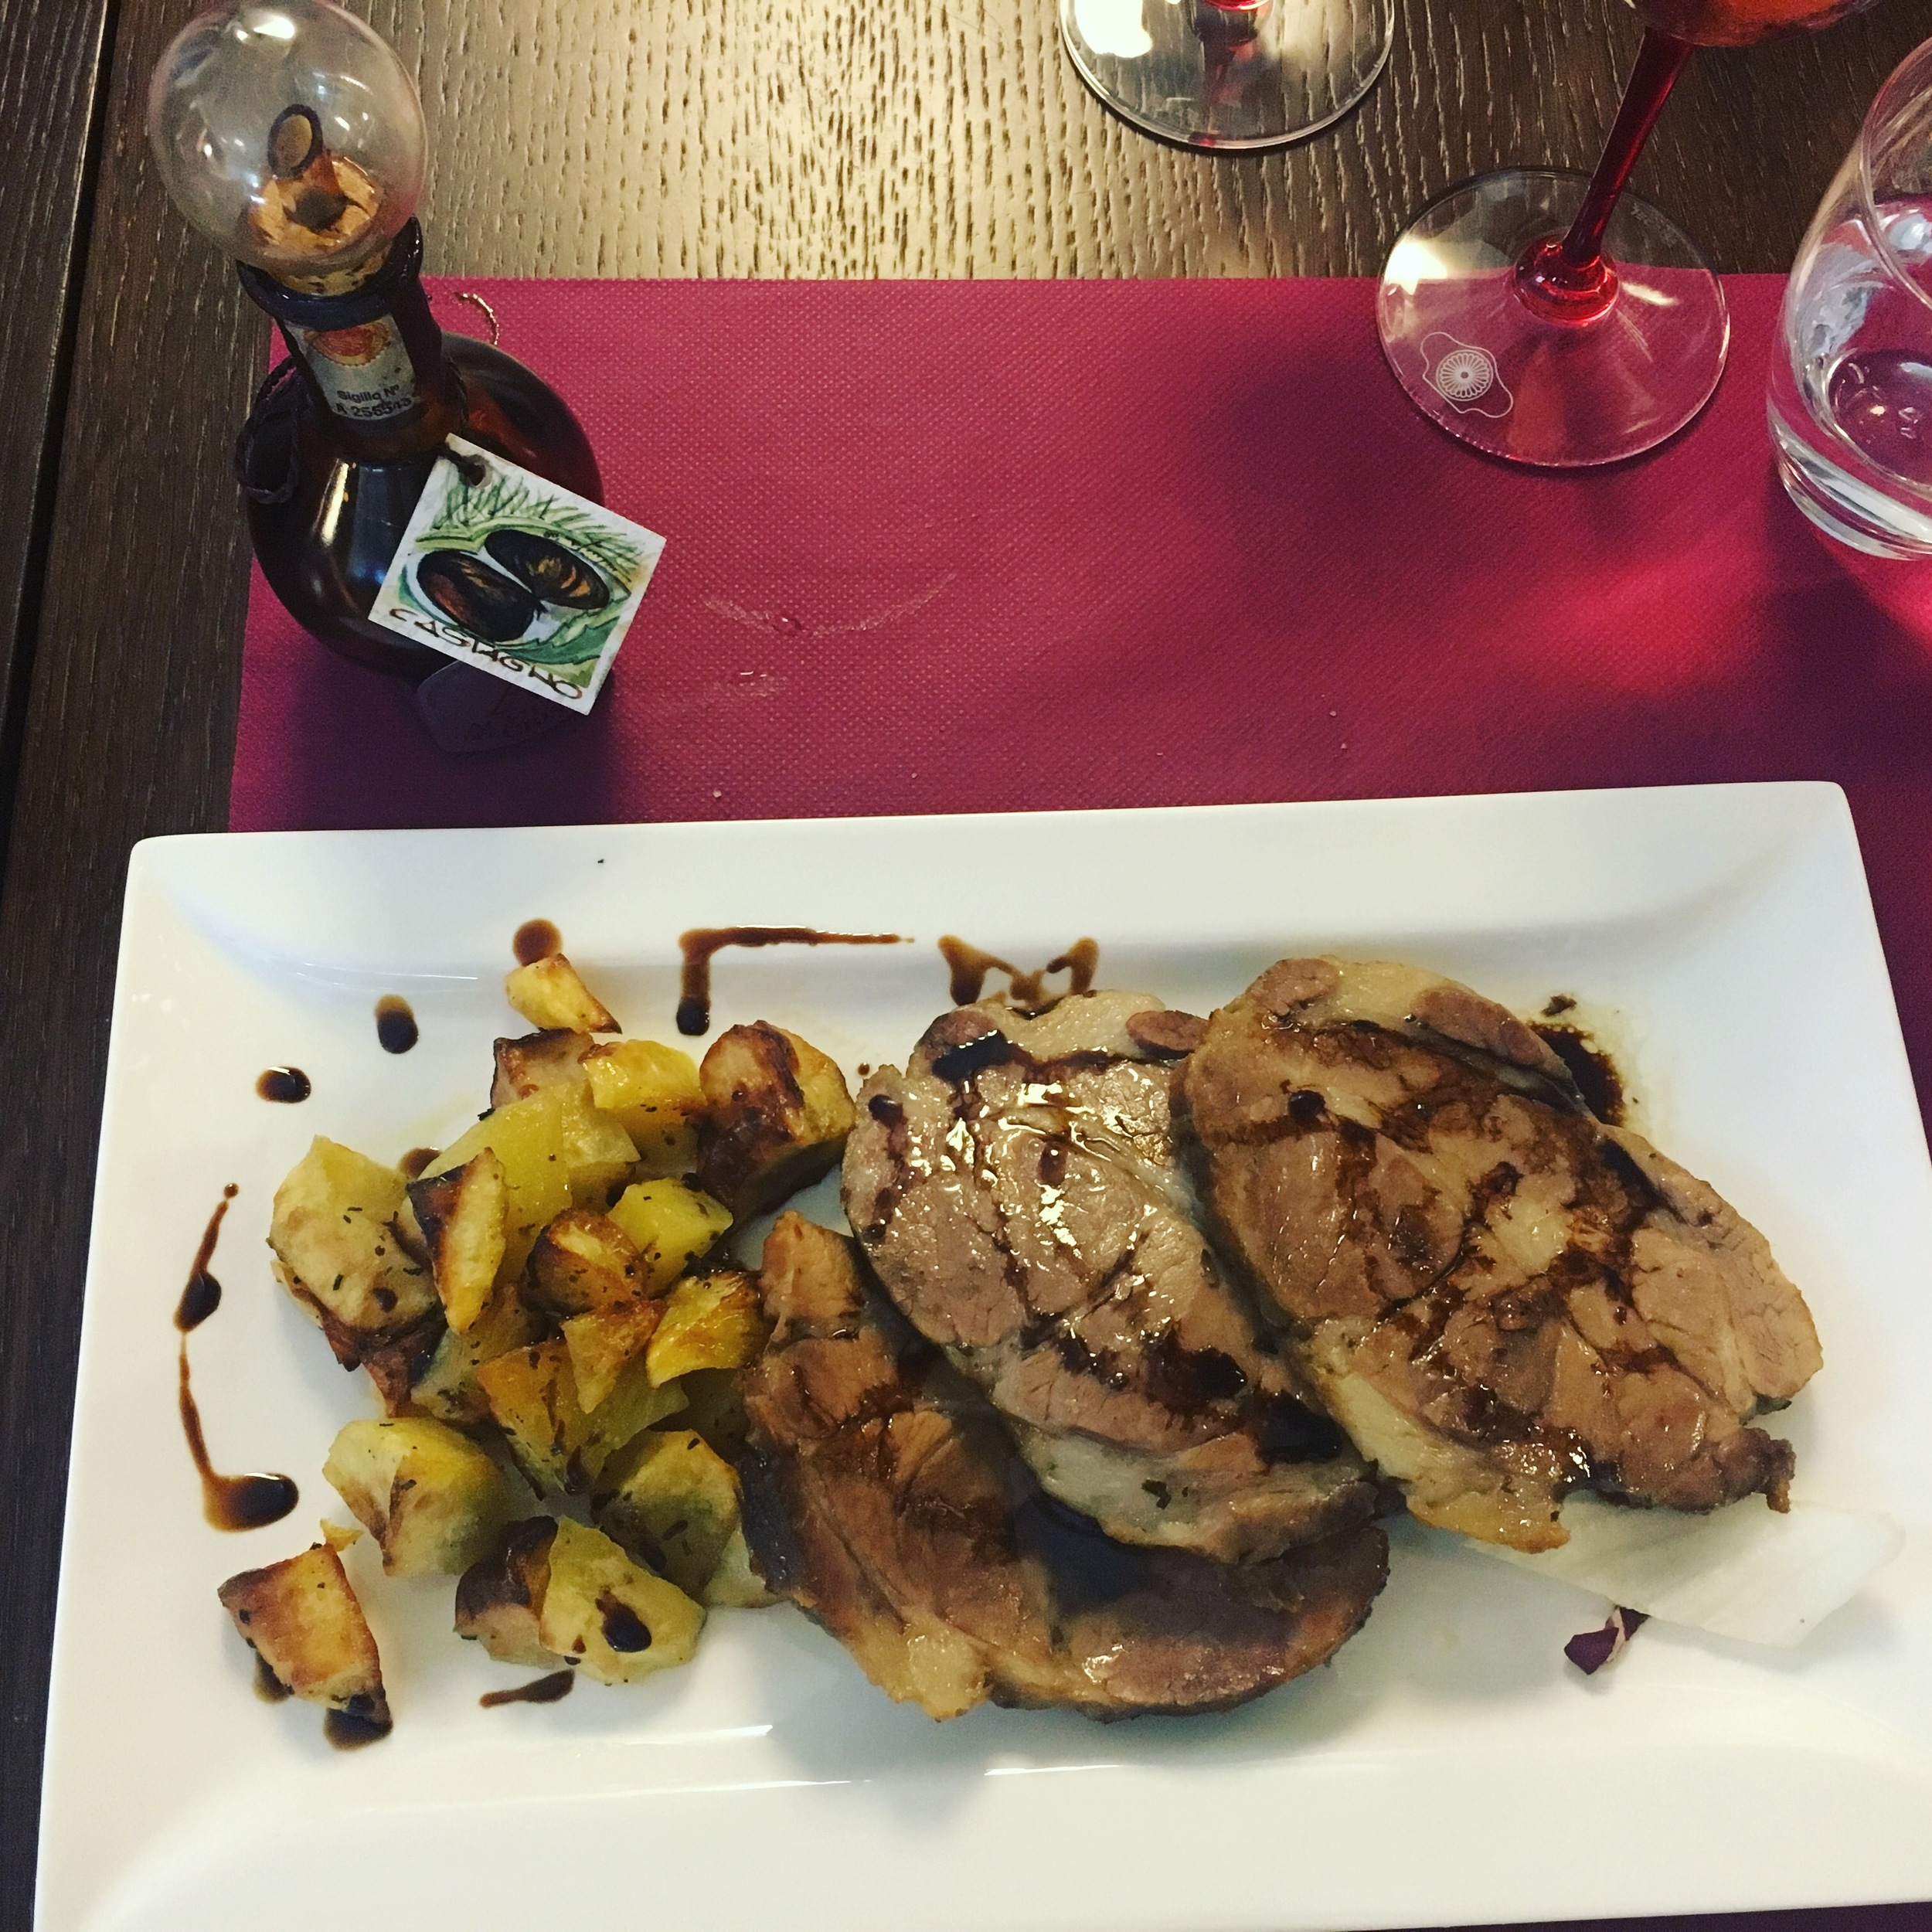 I drizzled mine onto roasted pork and potatoes. Heaven.